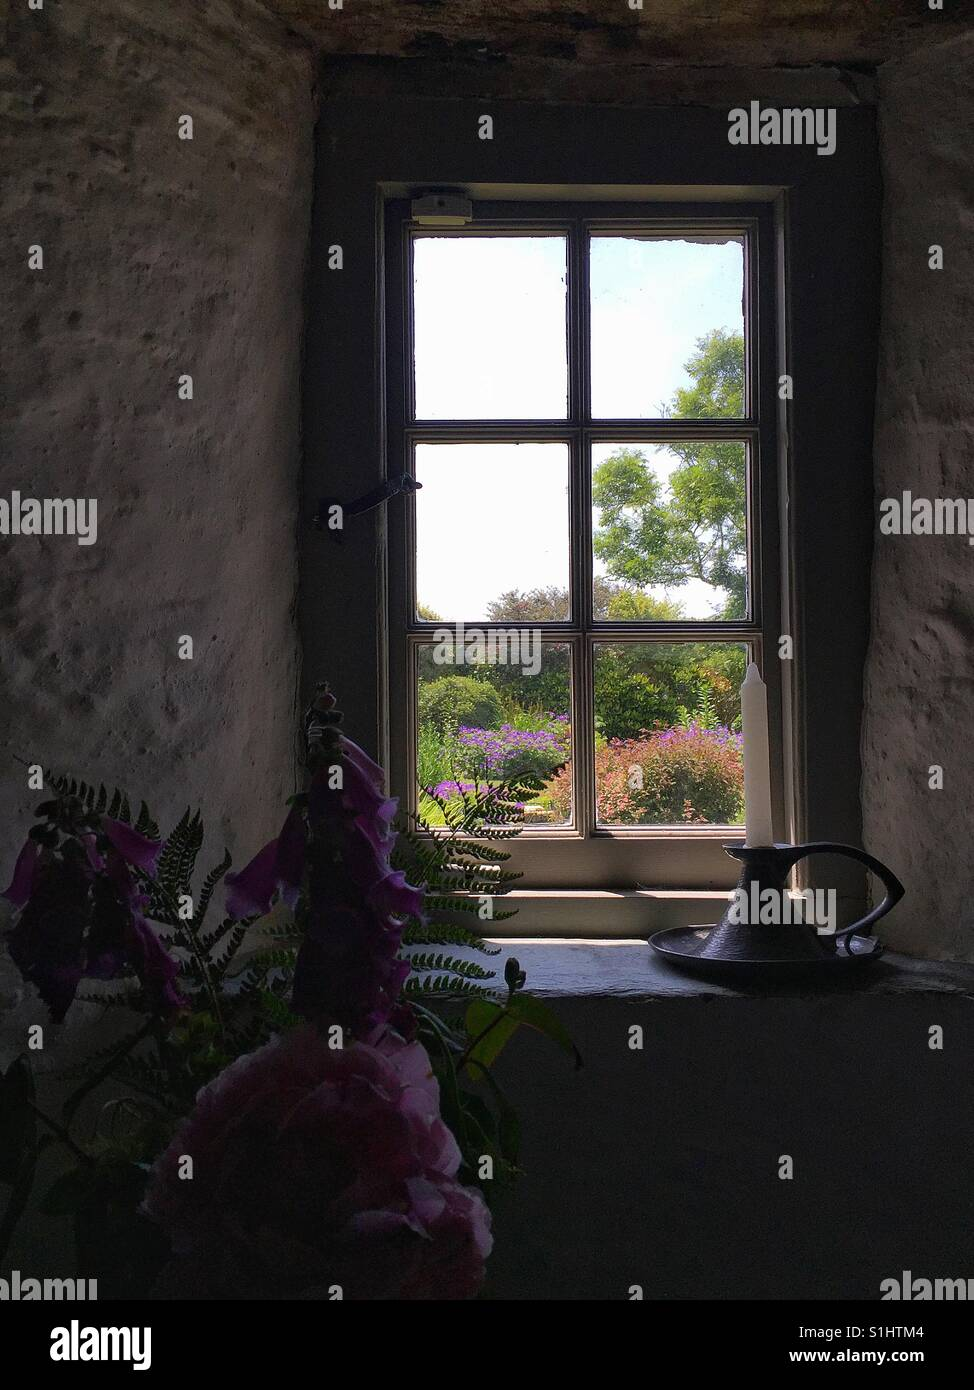 Flowers Through Window Stockfotos & Flowers Through Window Bilder ...